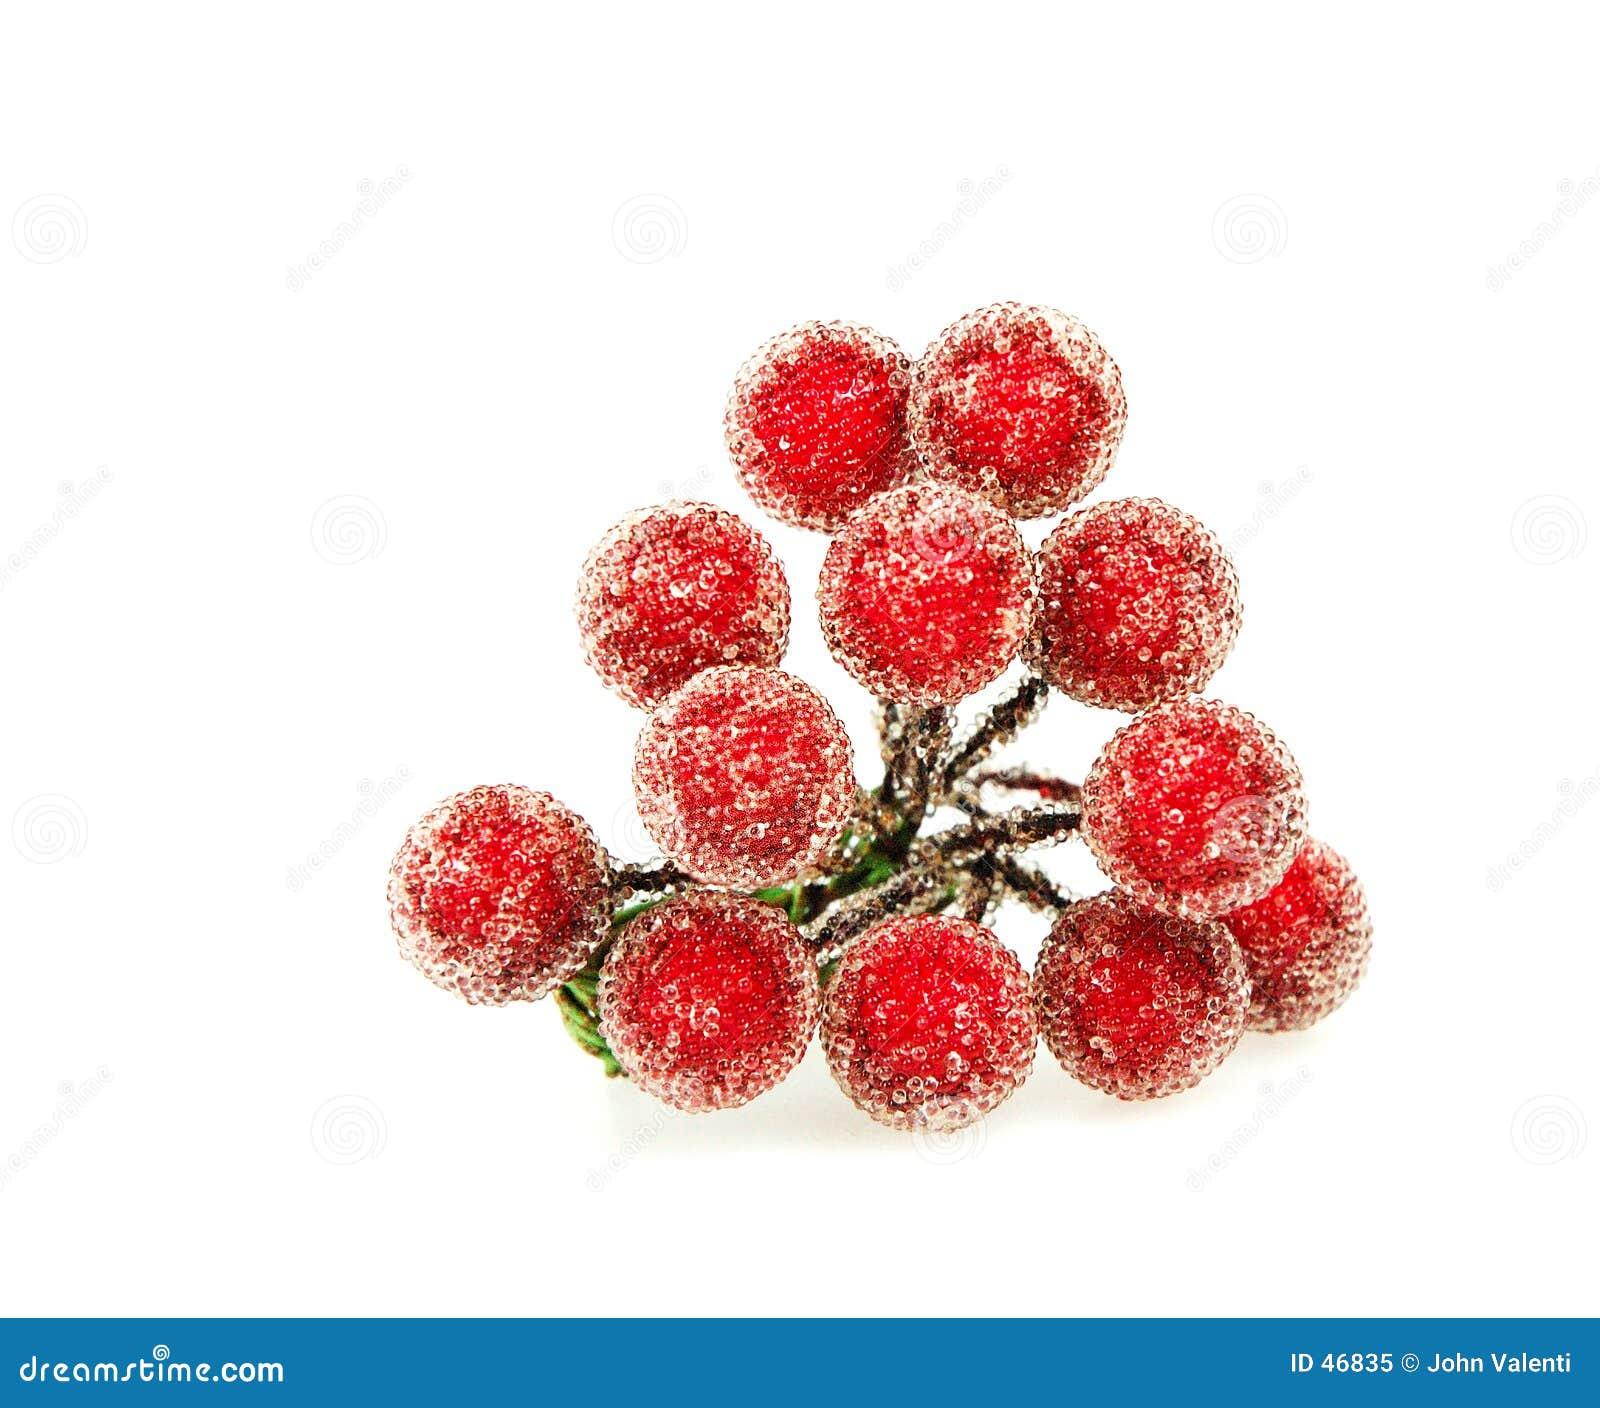 Holly czerwona jagoda